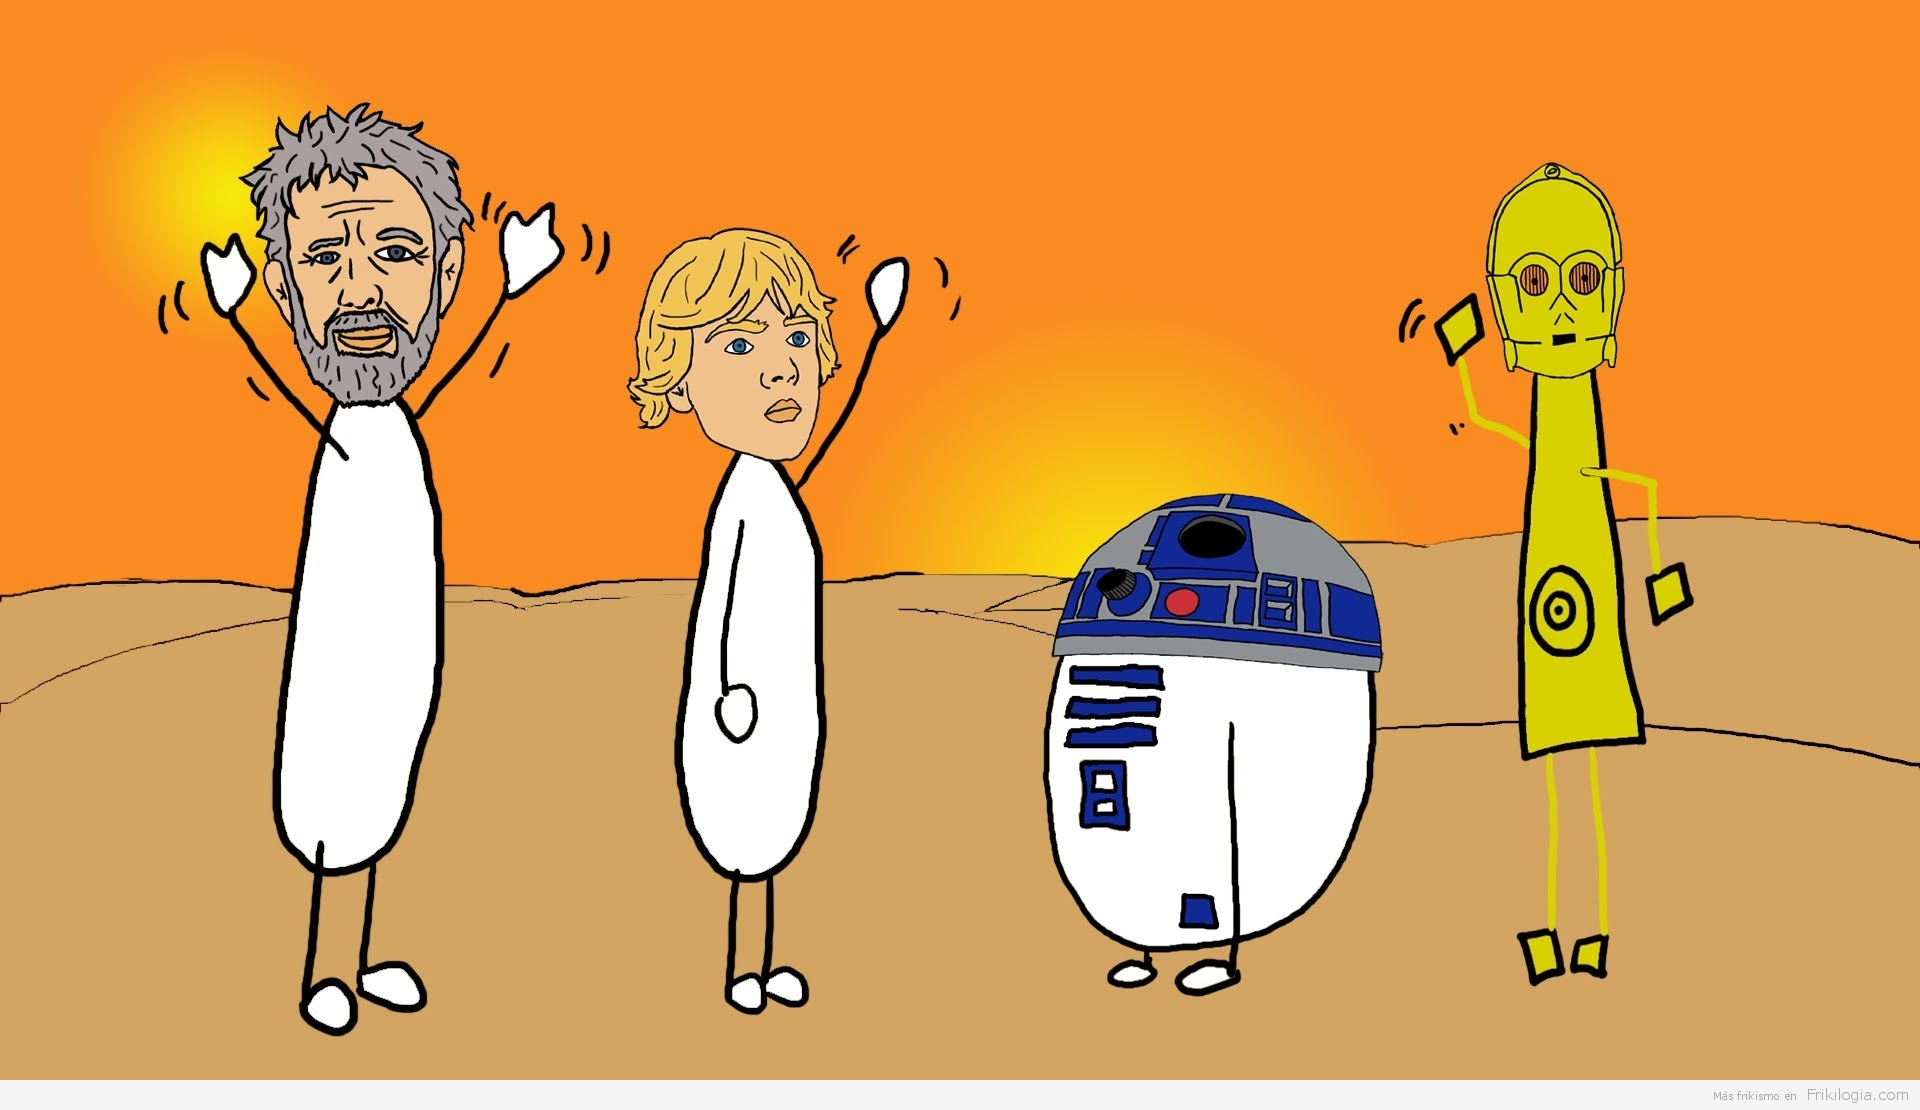 Japonesa Mika explica claramente Star Wars